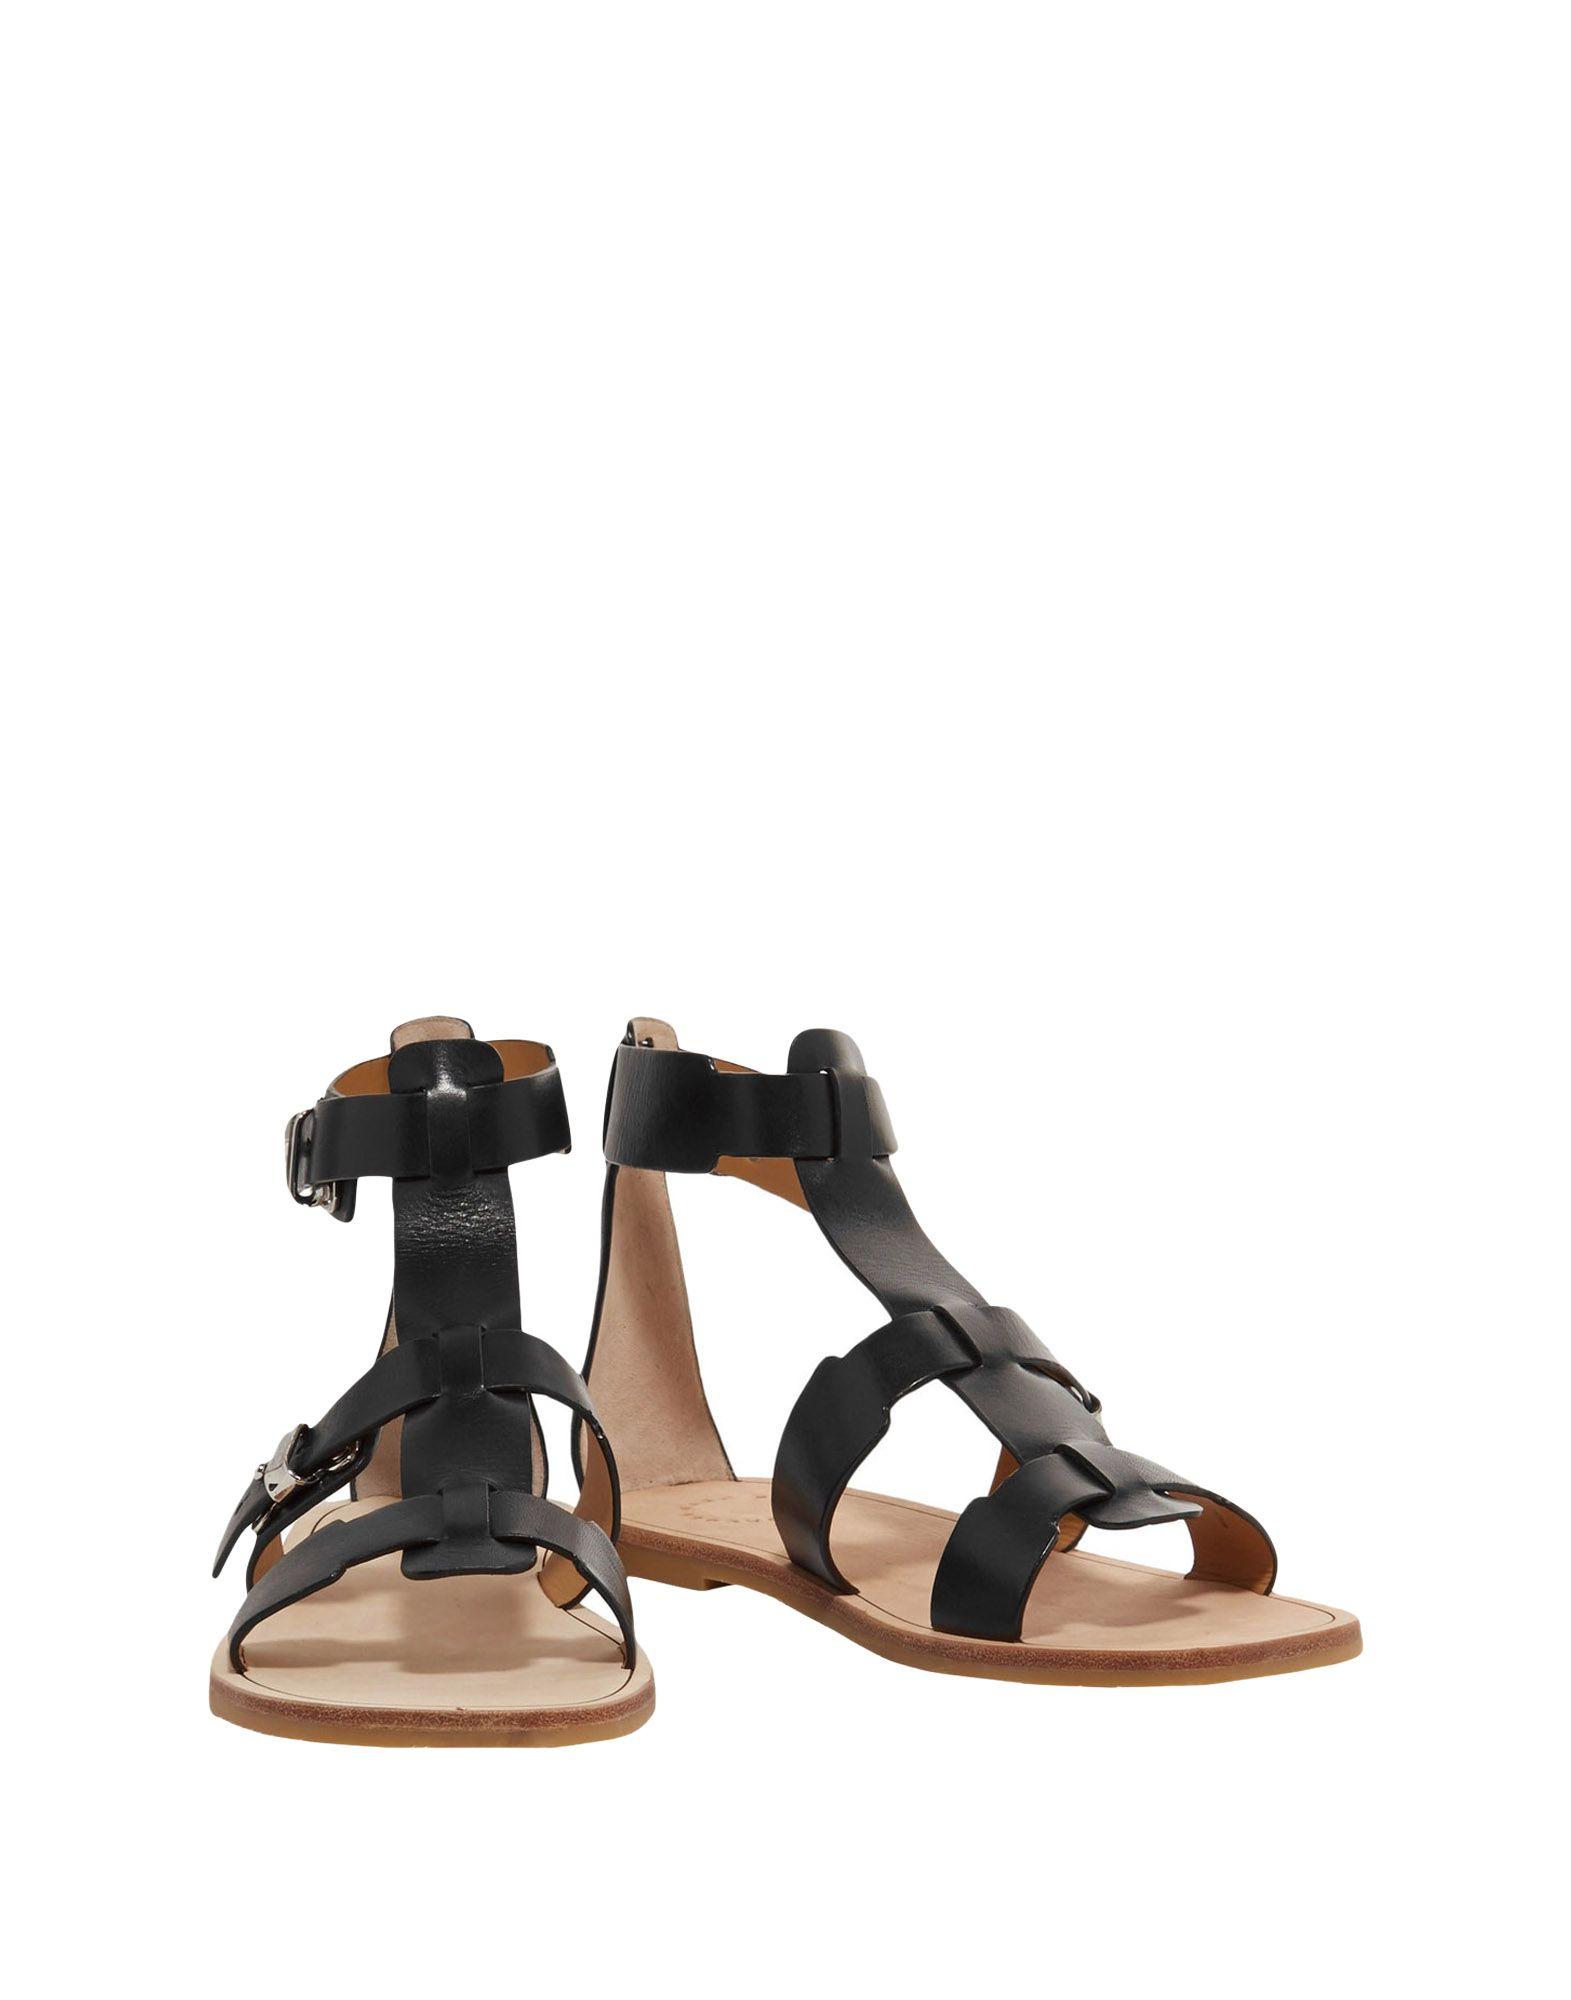 Marc By Marc Jacobs Sandalen Damen  11529983KRGut aussehende strapazierfähige Schuhe